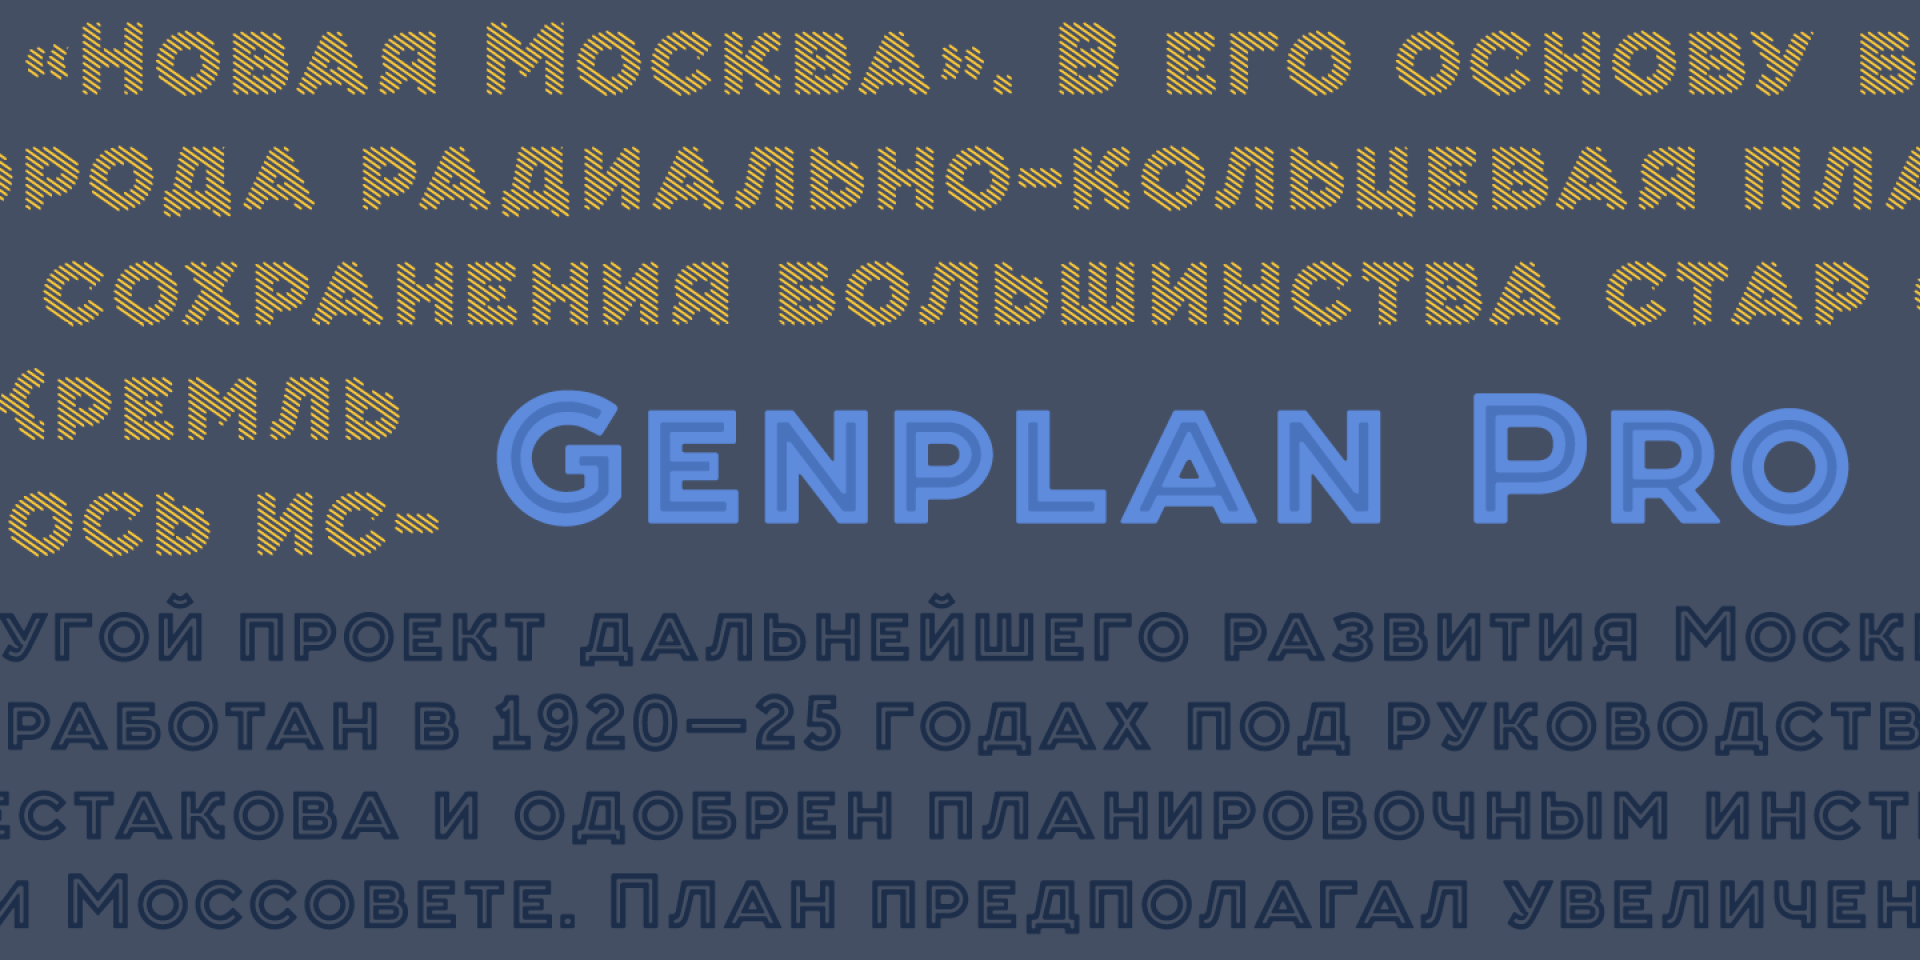 Genplan Pro